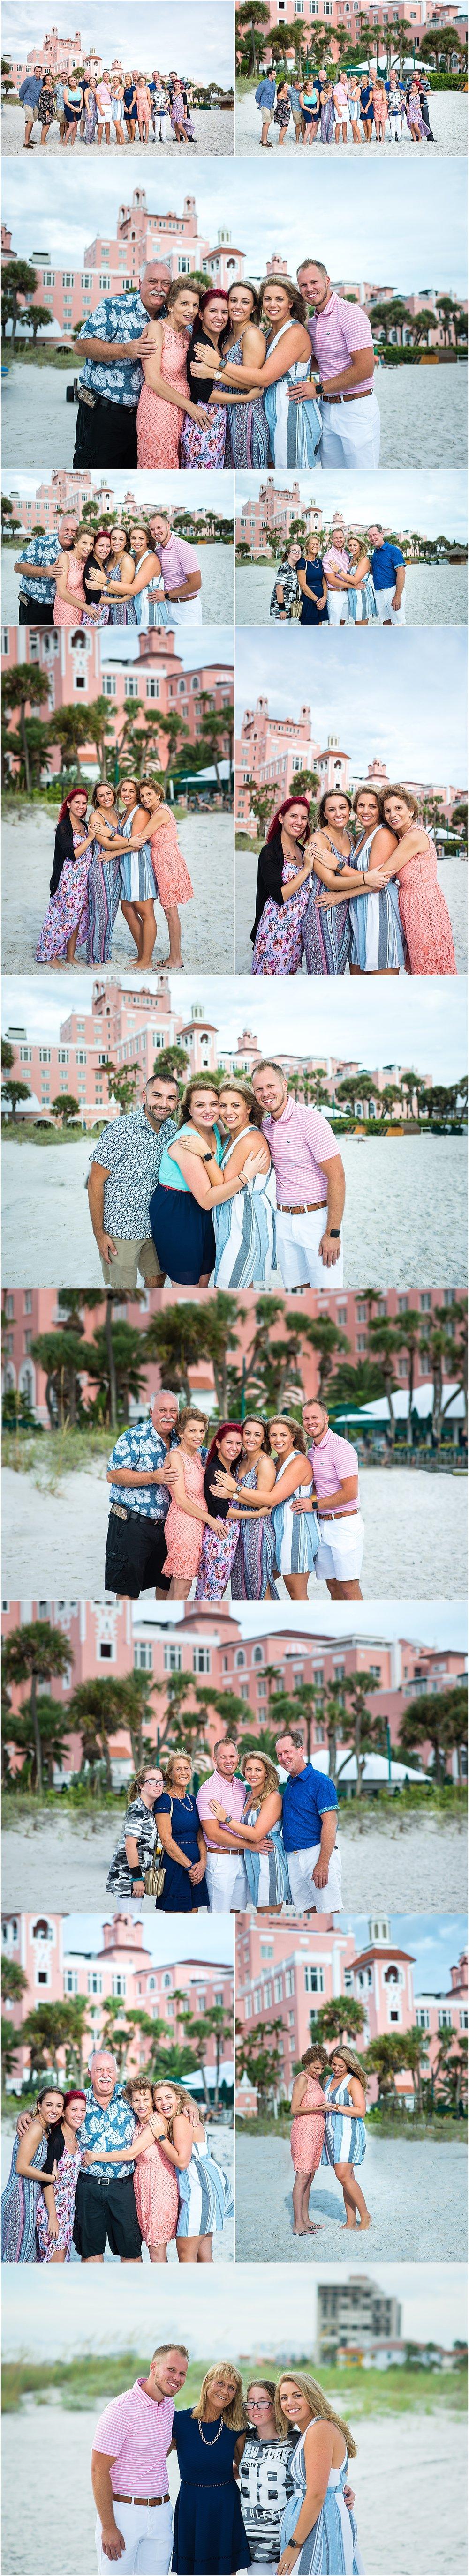 Beach_Proposal_StPete3.jpg